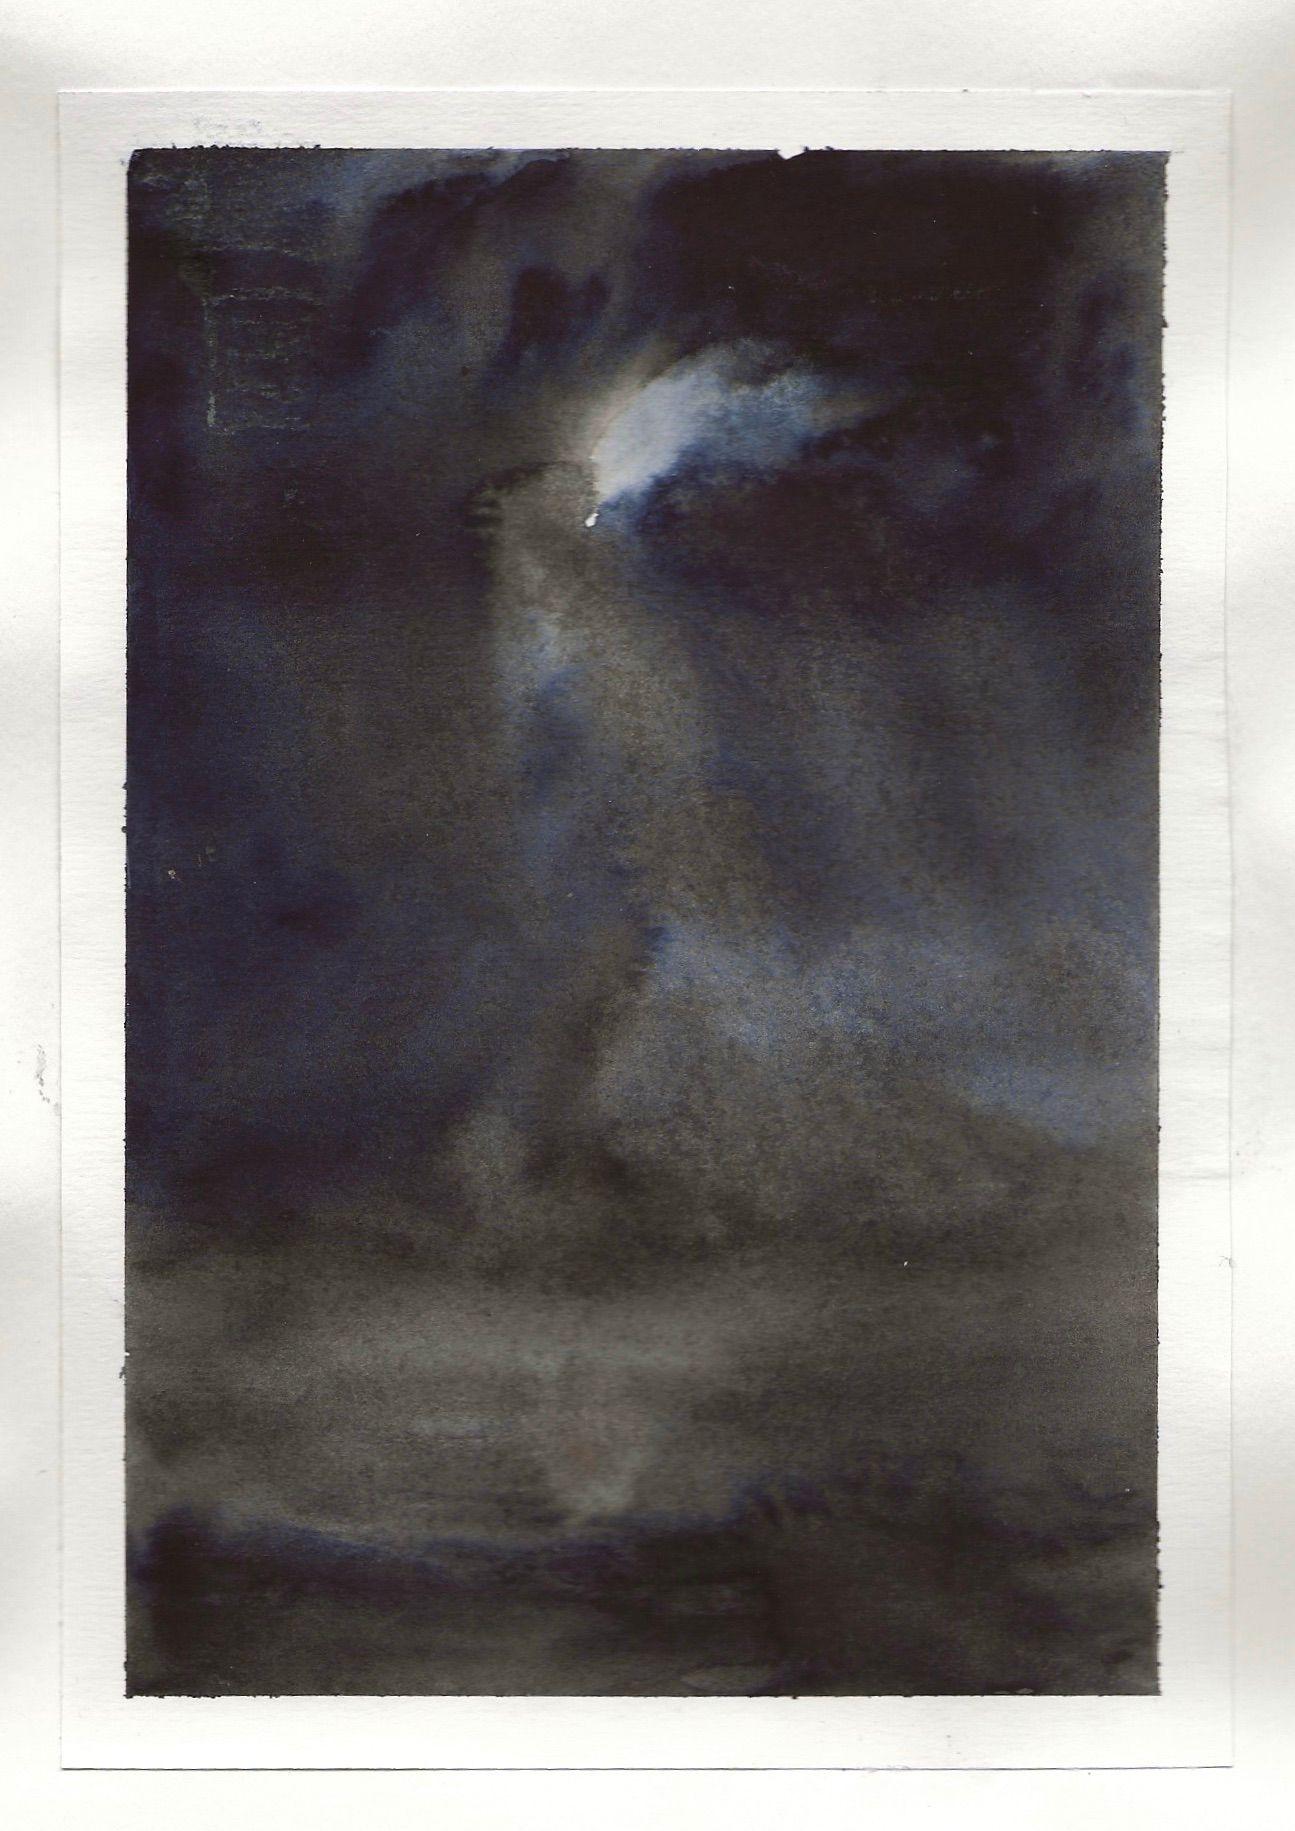 watercolour studies - sequence 1 - #1 - watercolour - 148 x 210mm - 200gsm 120lb